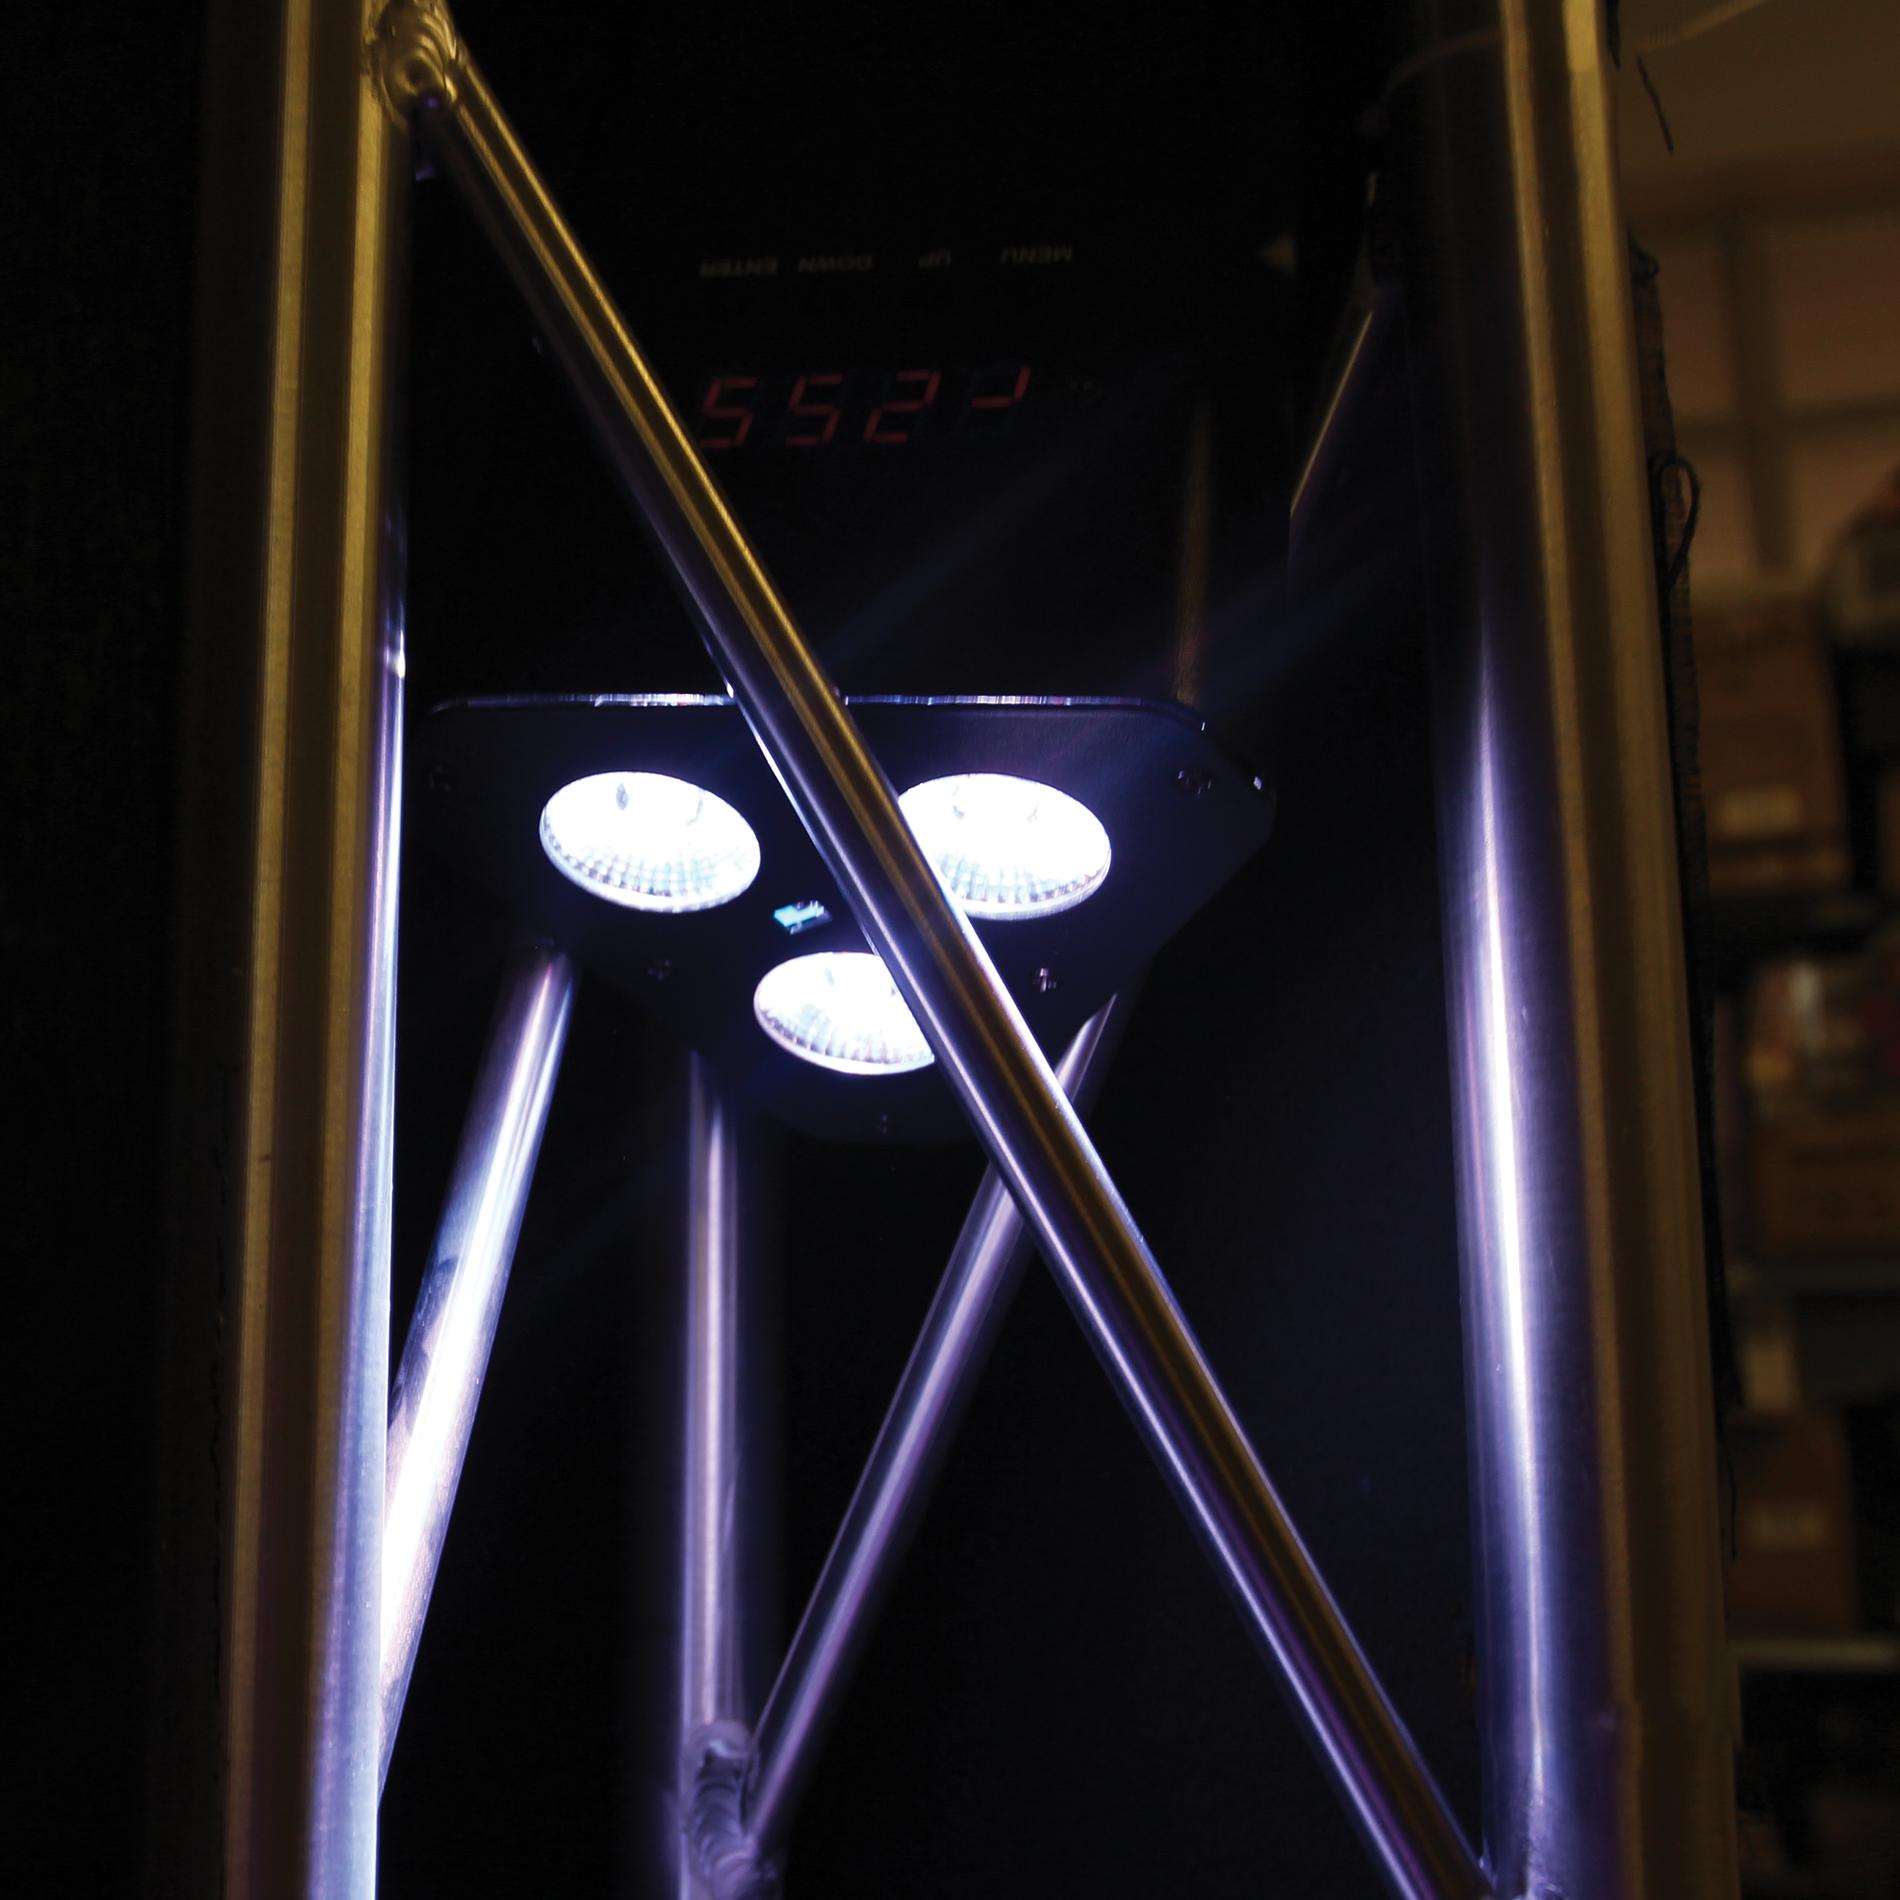 Power Rgbw 3x5w Lighting Led Triangulaire Projecteur Sur Batterie WE2YHD9Ie